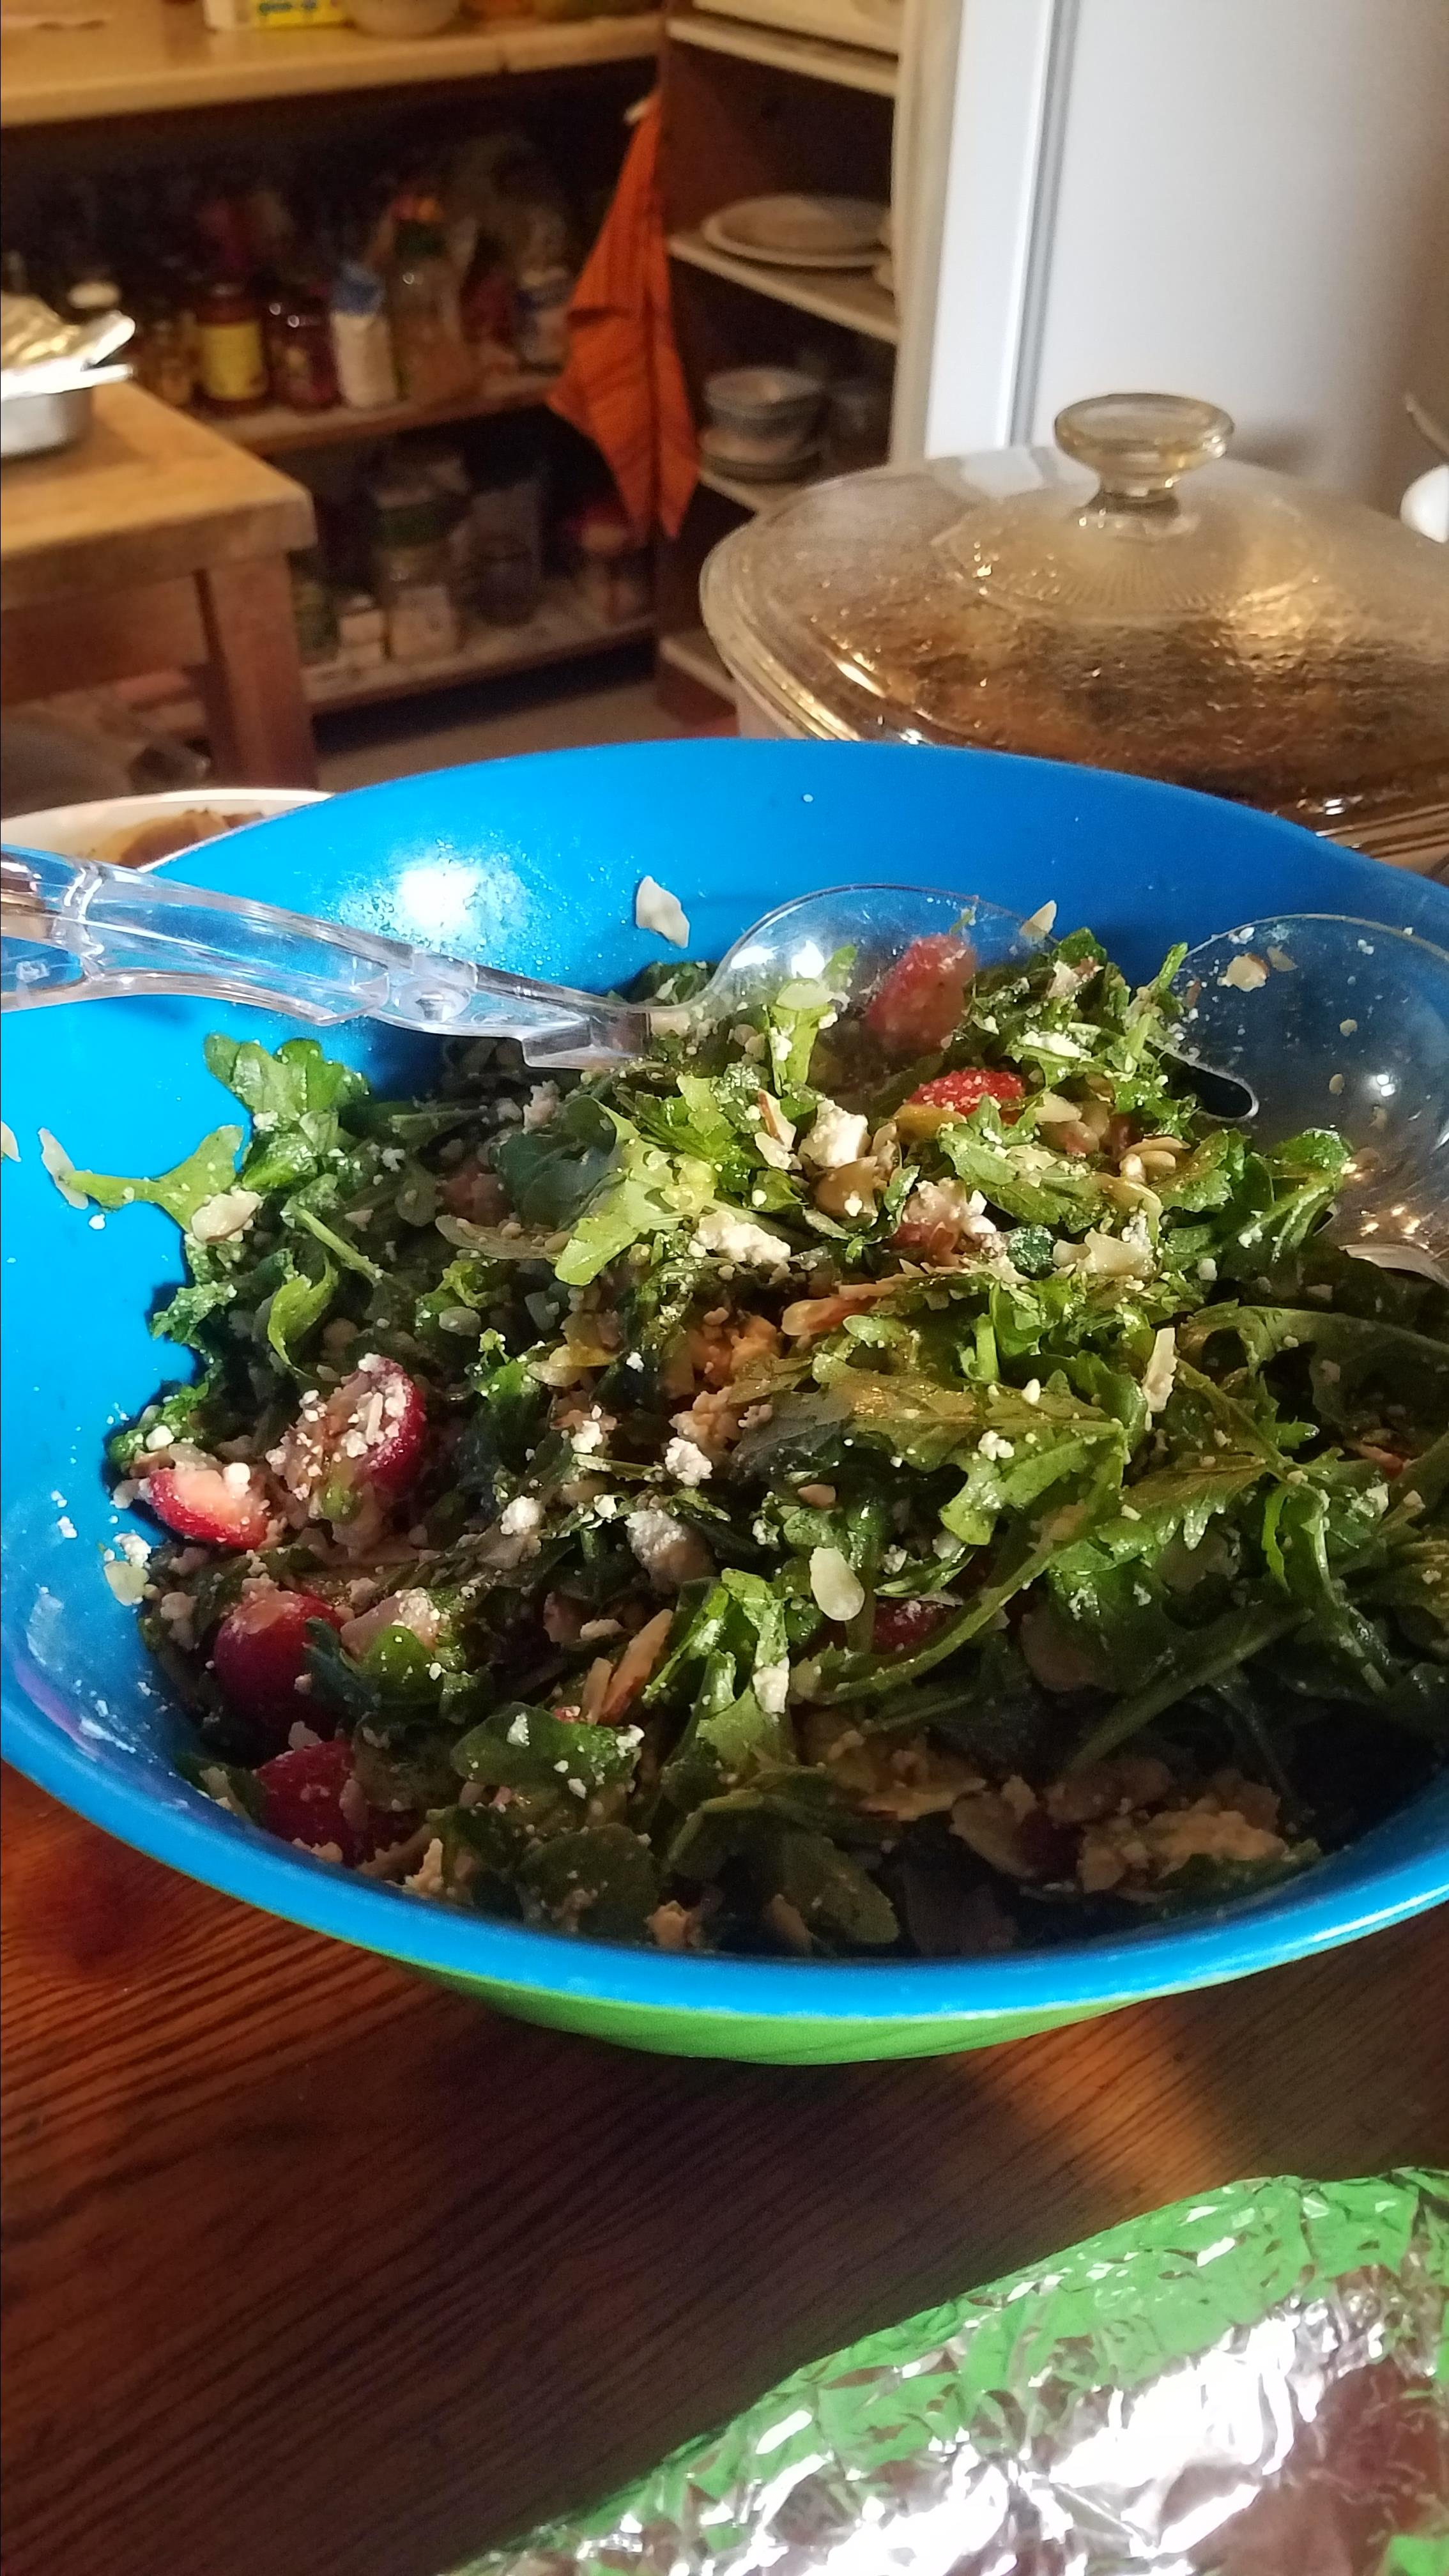 Arugula and Strawberry Salad with Feta Cheese girlcat21 aj